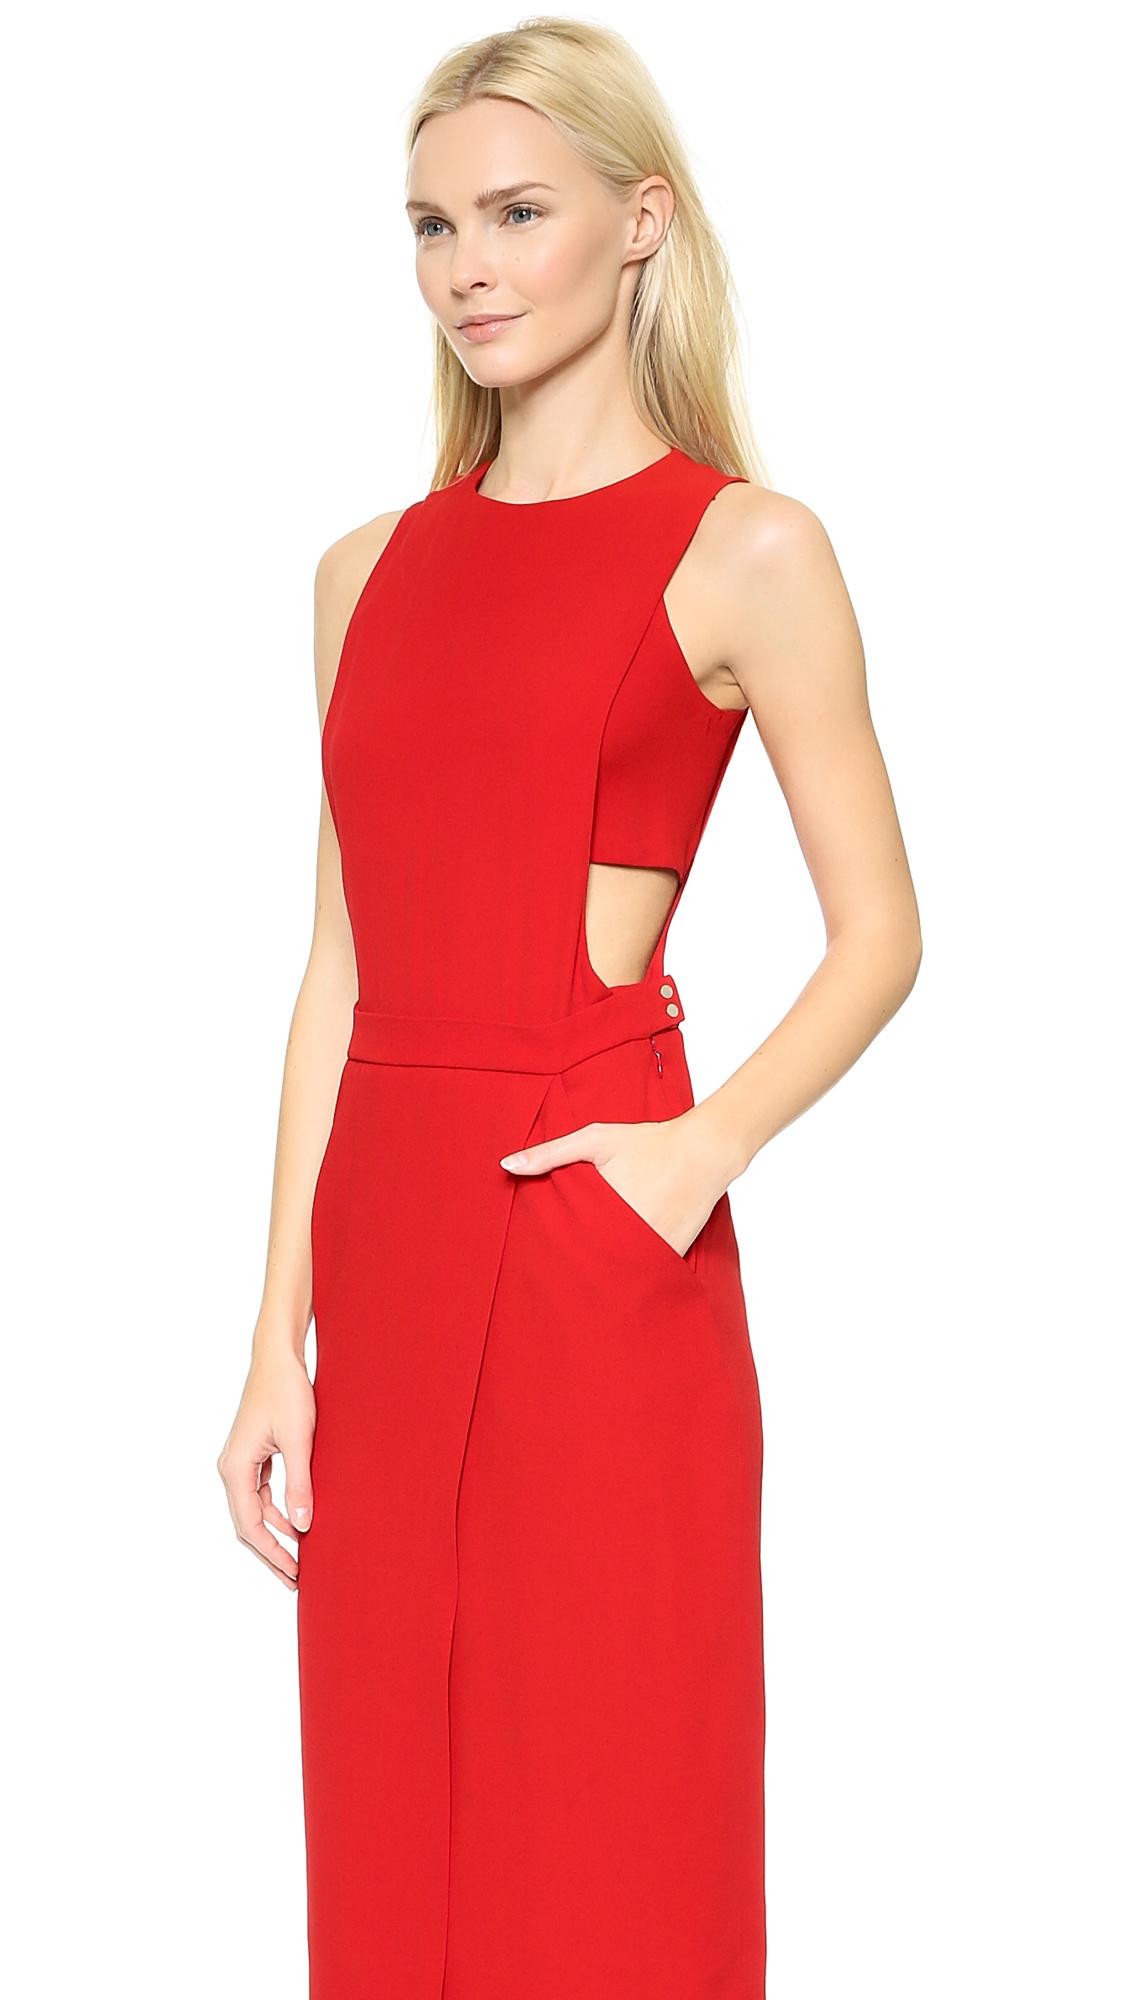 A.L.C. Monty Dress - Red in Red - Lyst